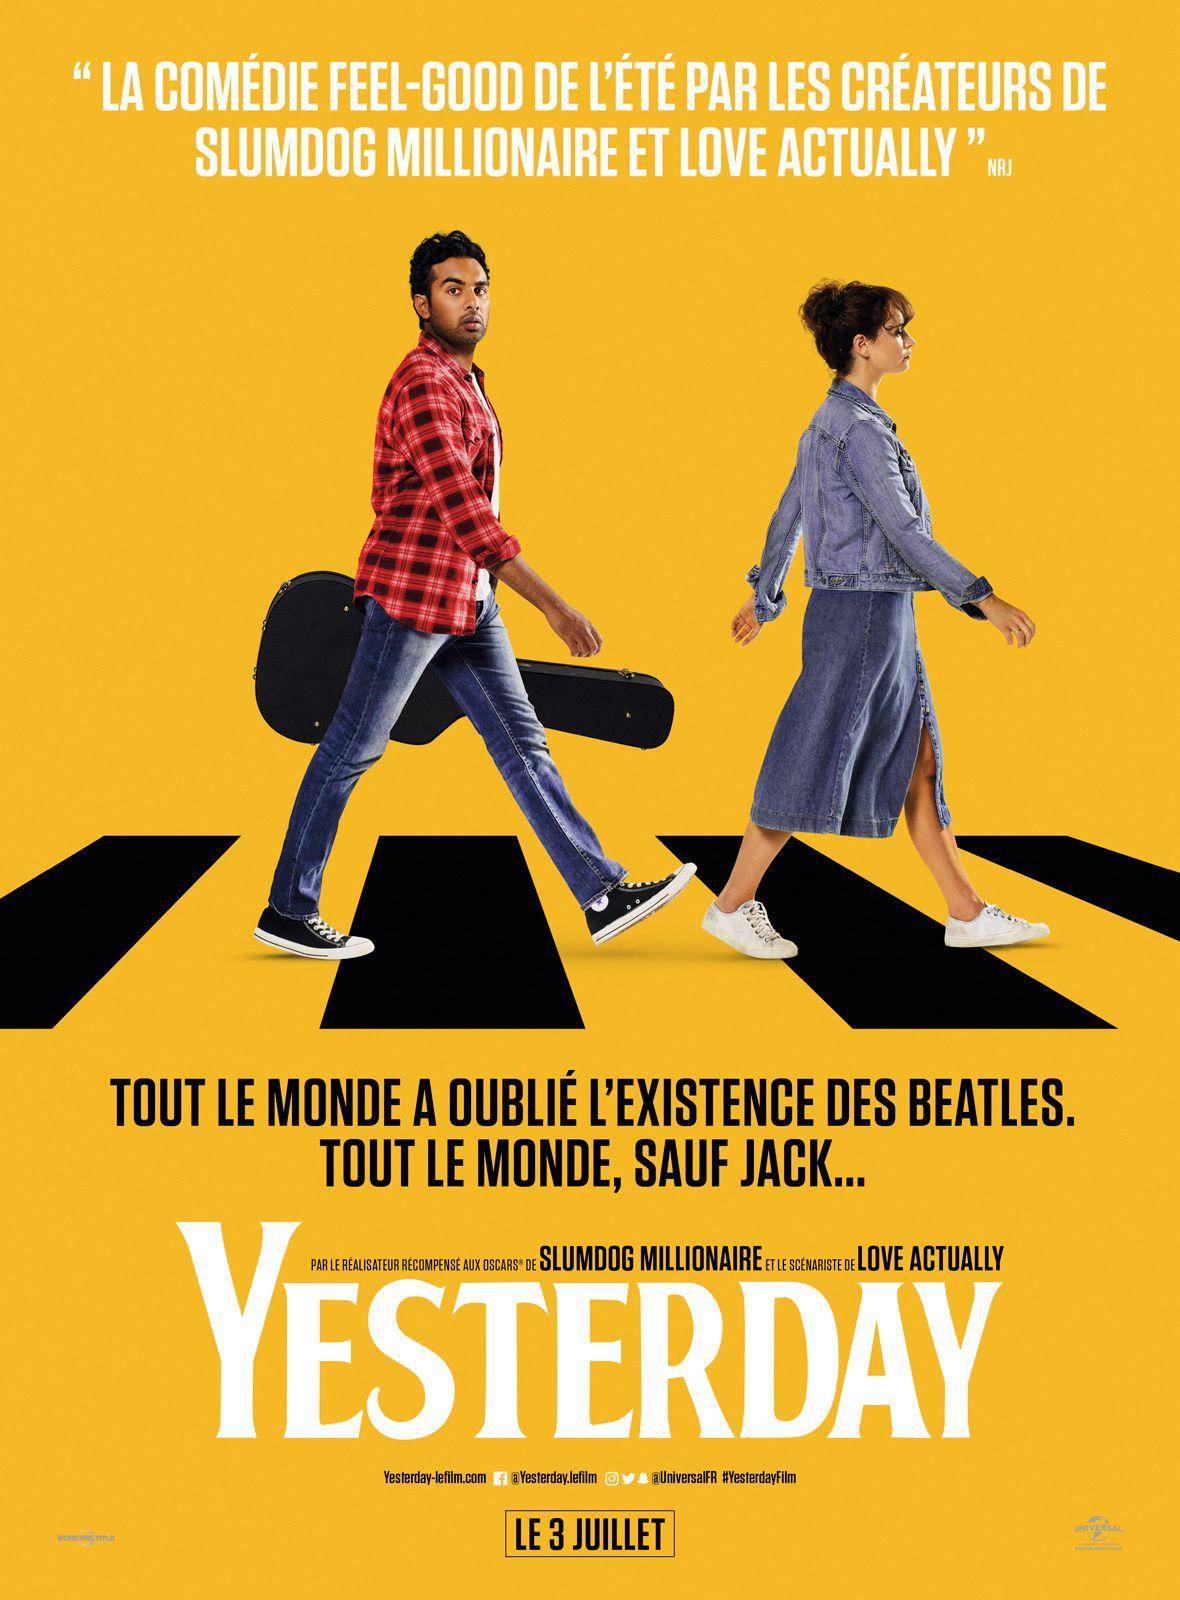 Film yesterday, dany boyle, beatles